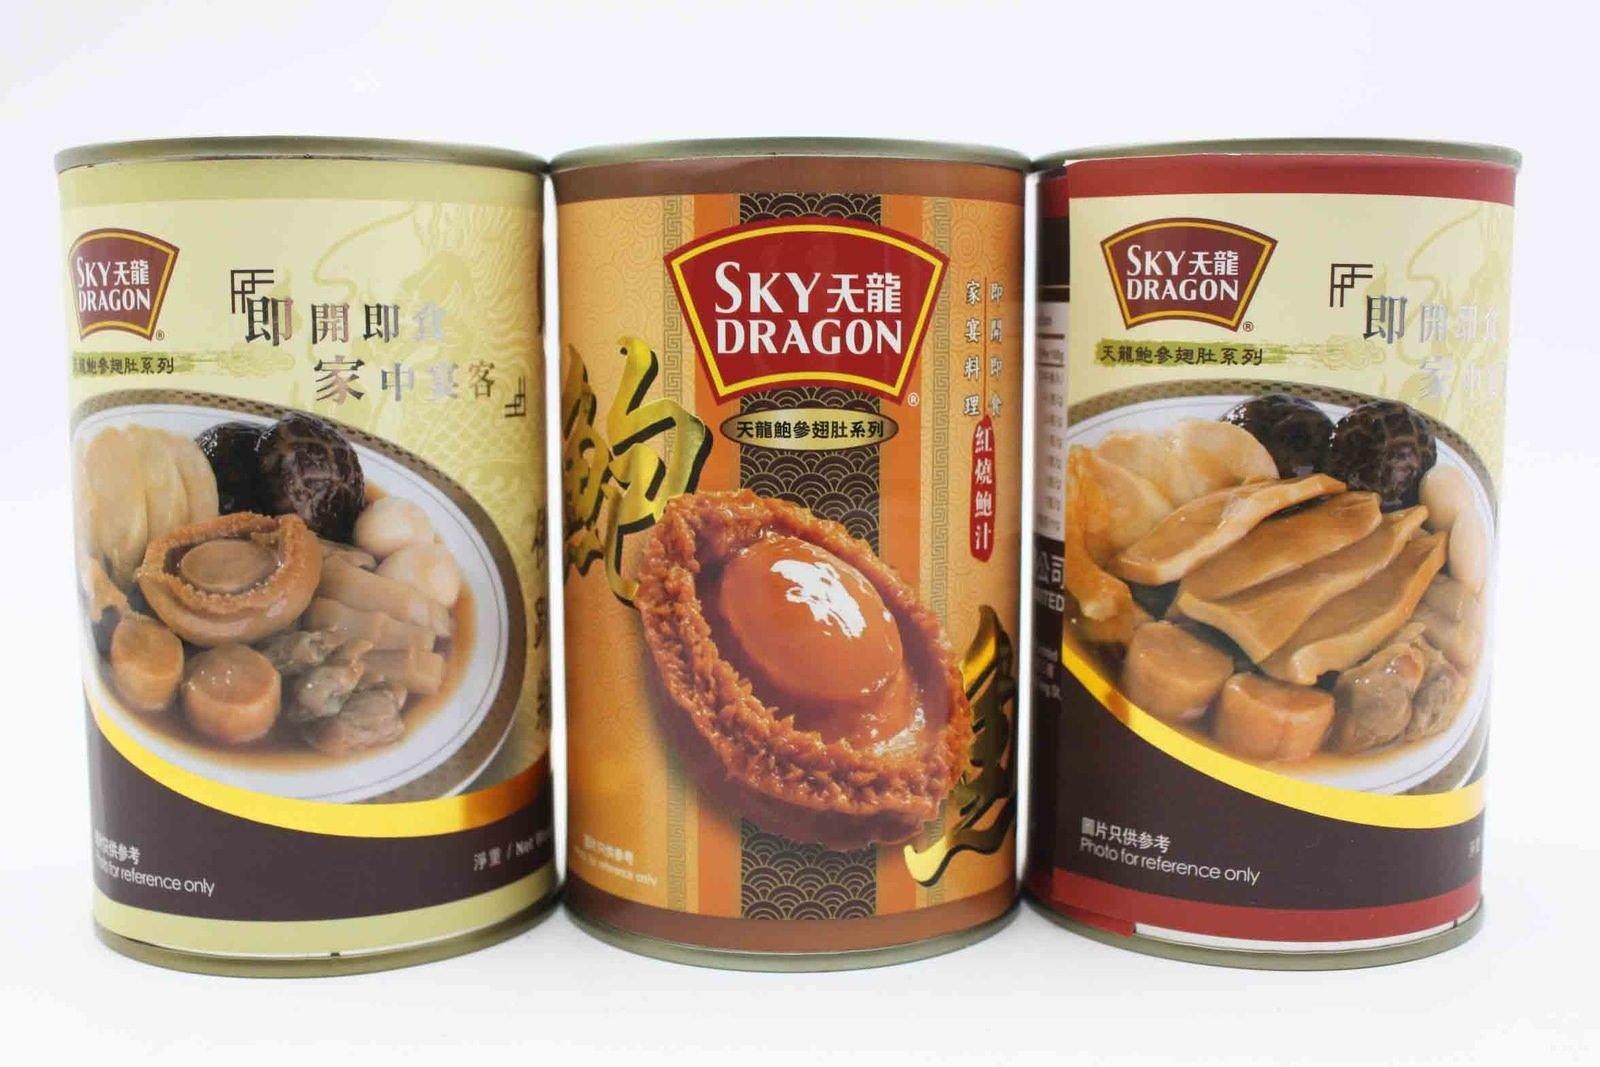 Set-10 Canned abalones x Seafood Fotiaoqiang x Abalone Fotiaoqiang Free Airmail